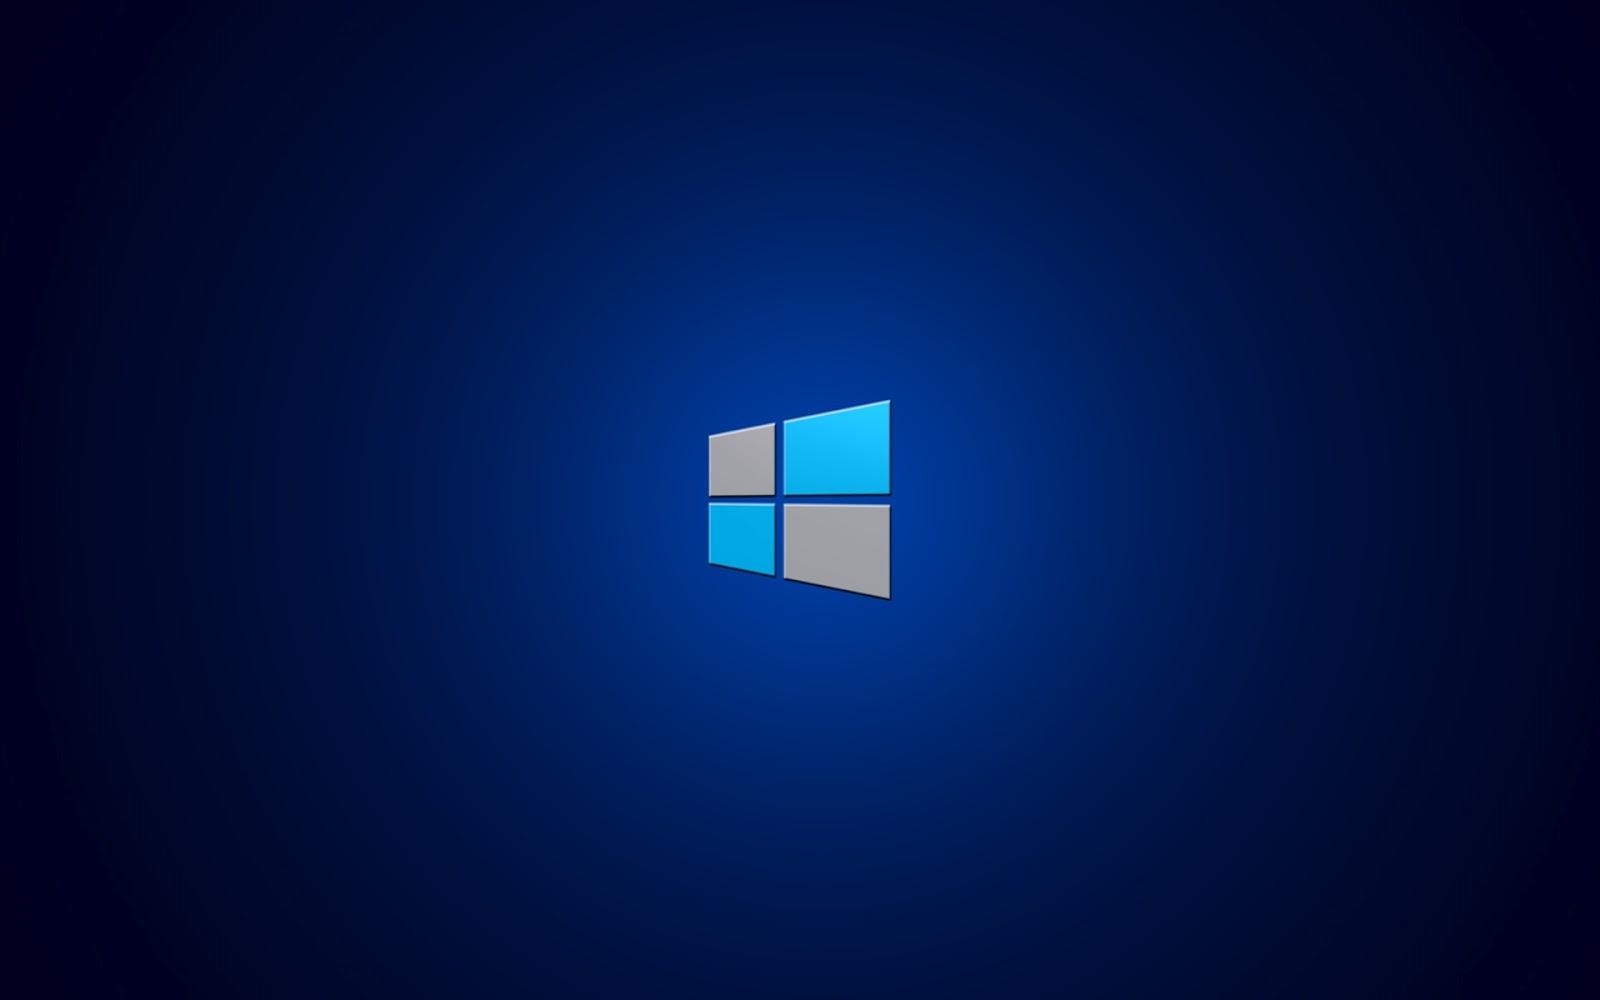 Wallpapers Full HD Windows 8 Microsoft 1600x1000